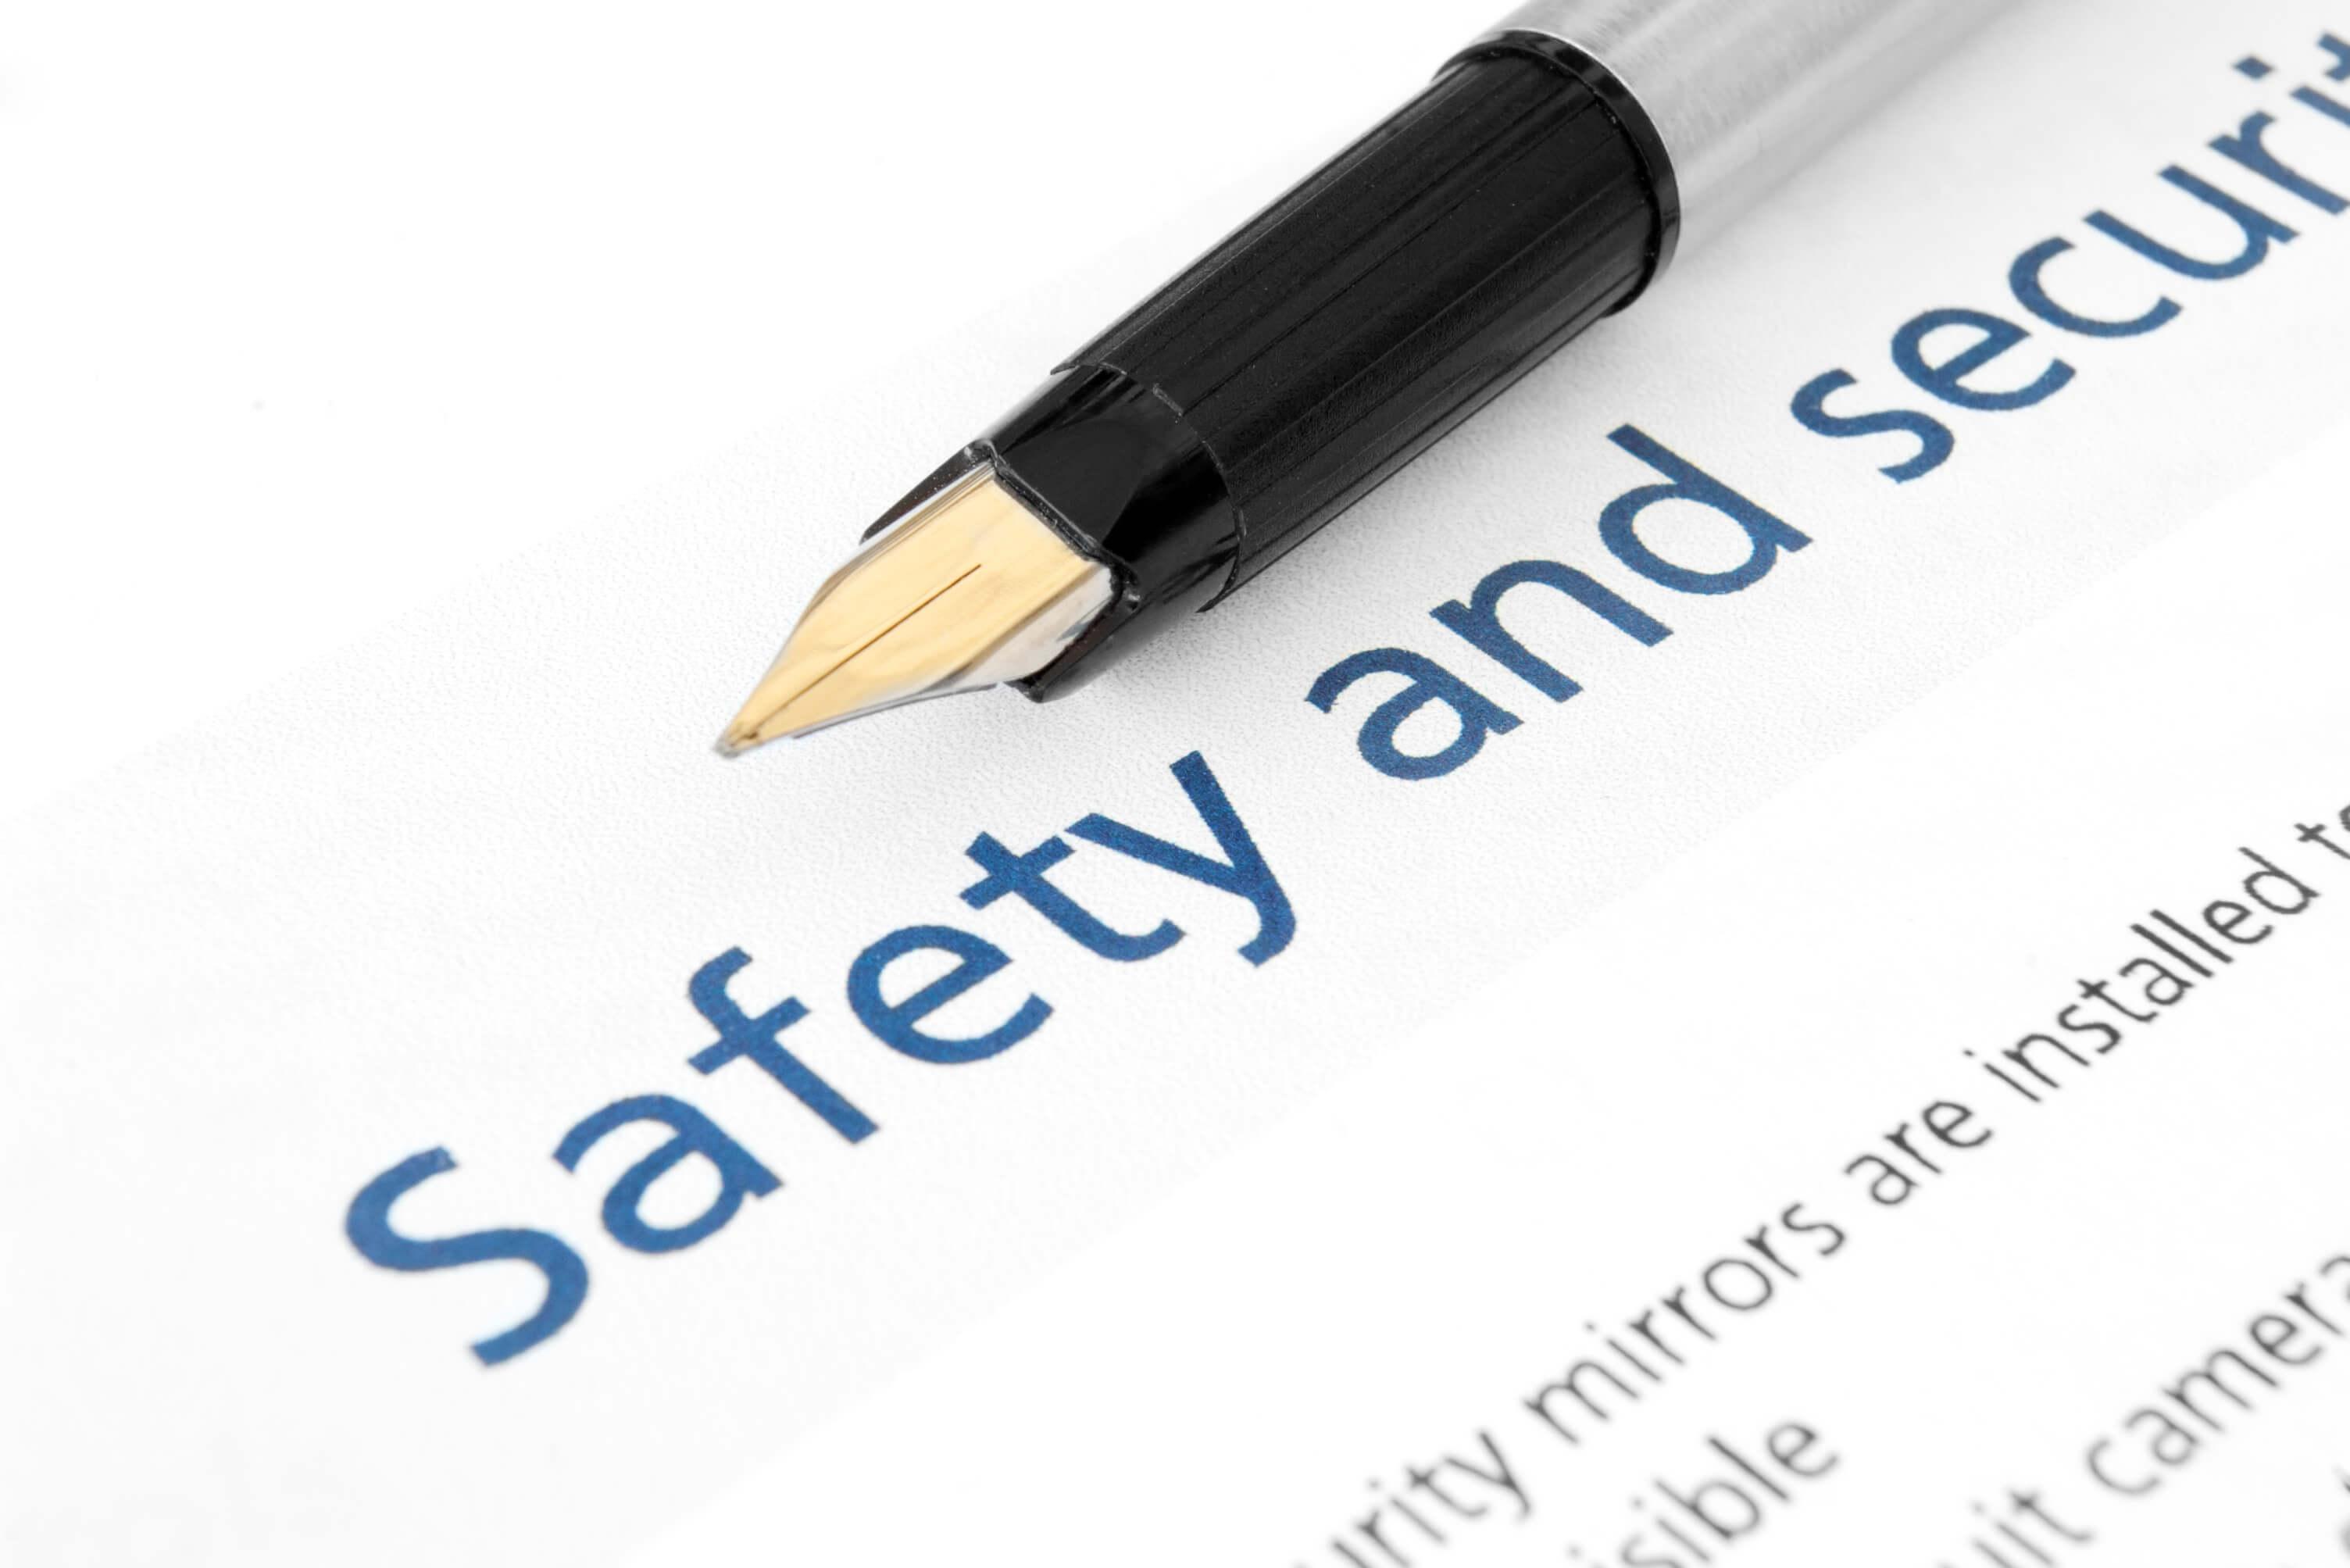 fire risk assessments